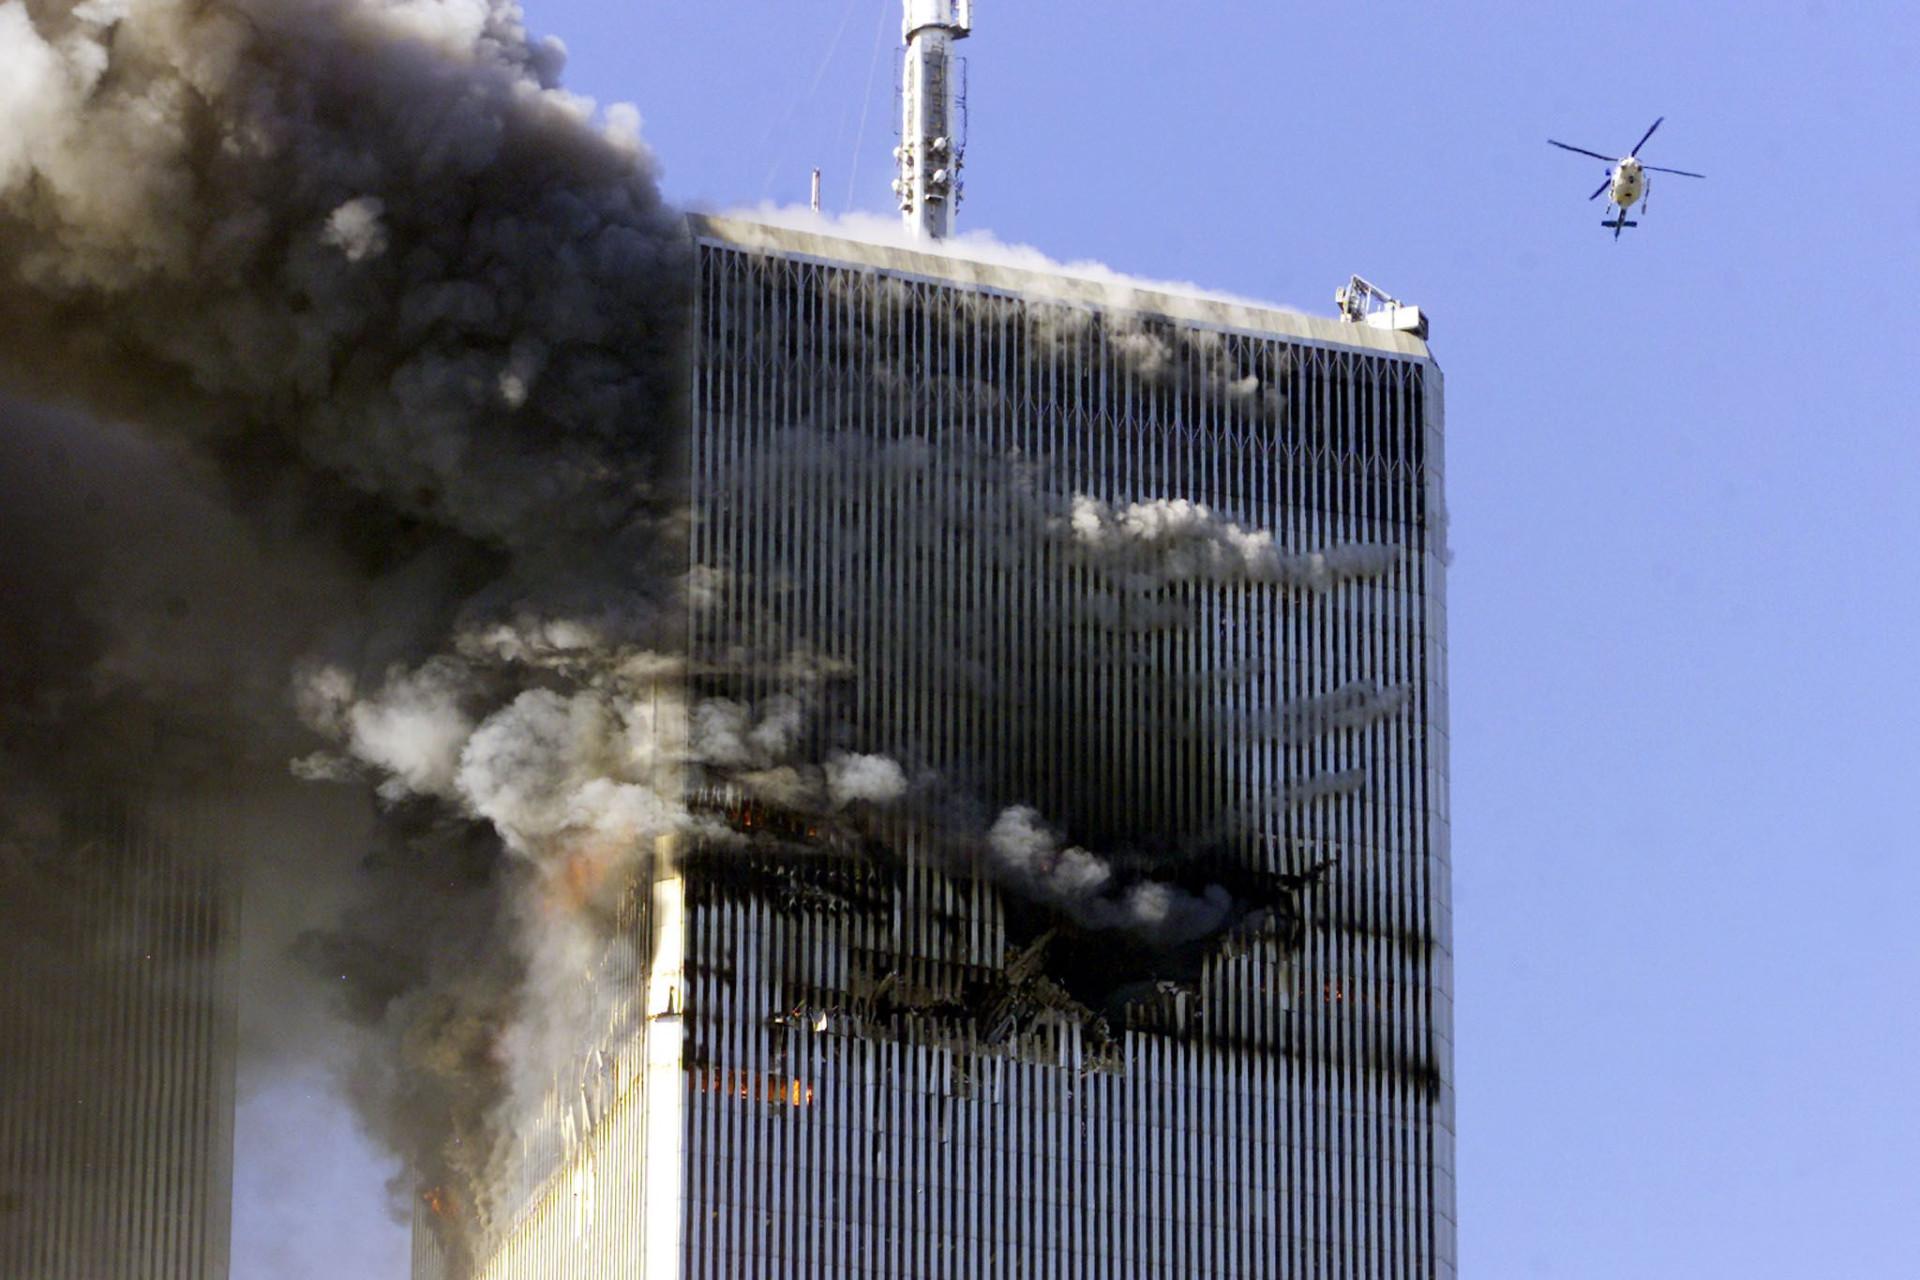 O 11 de Setembro: 17 anos do ataque que mudou o mundo